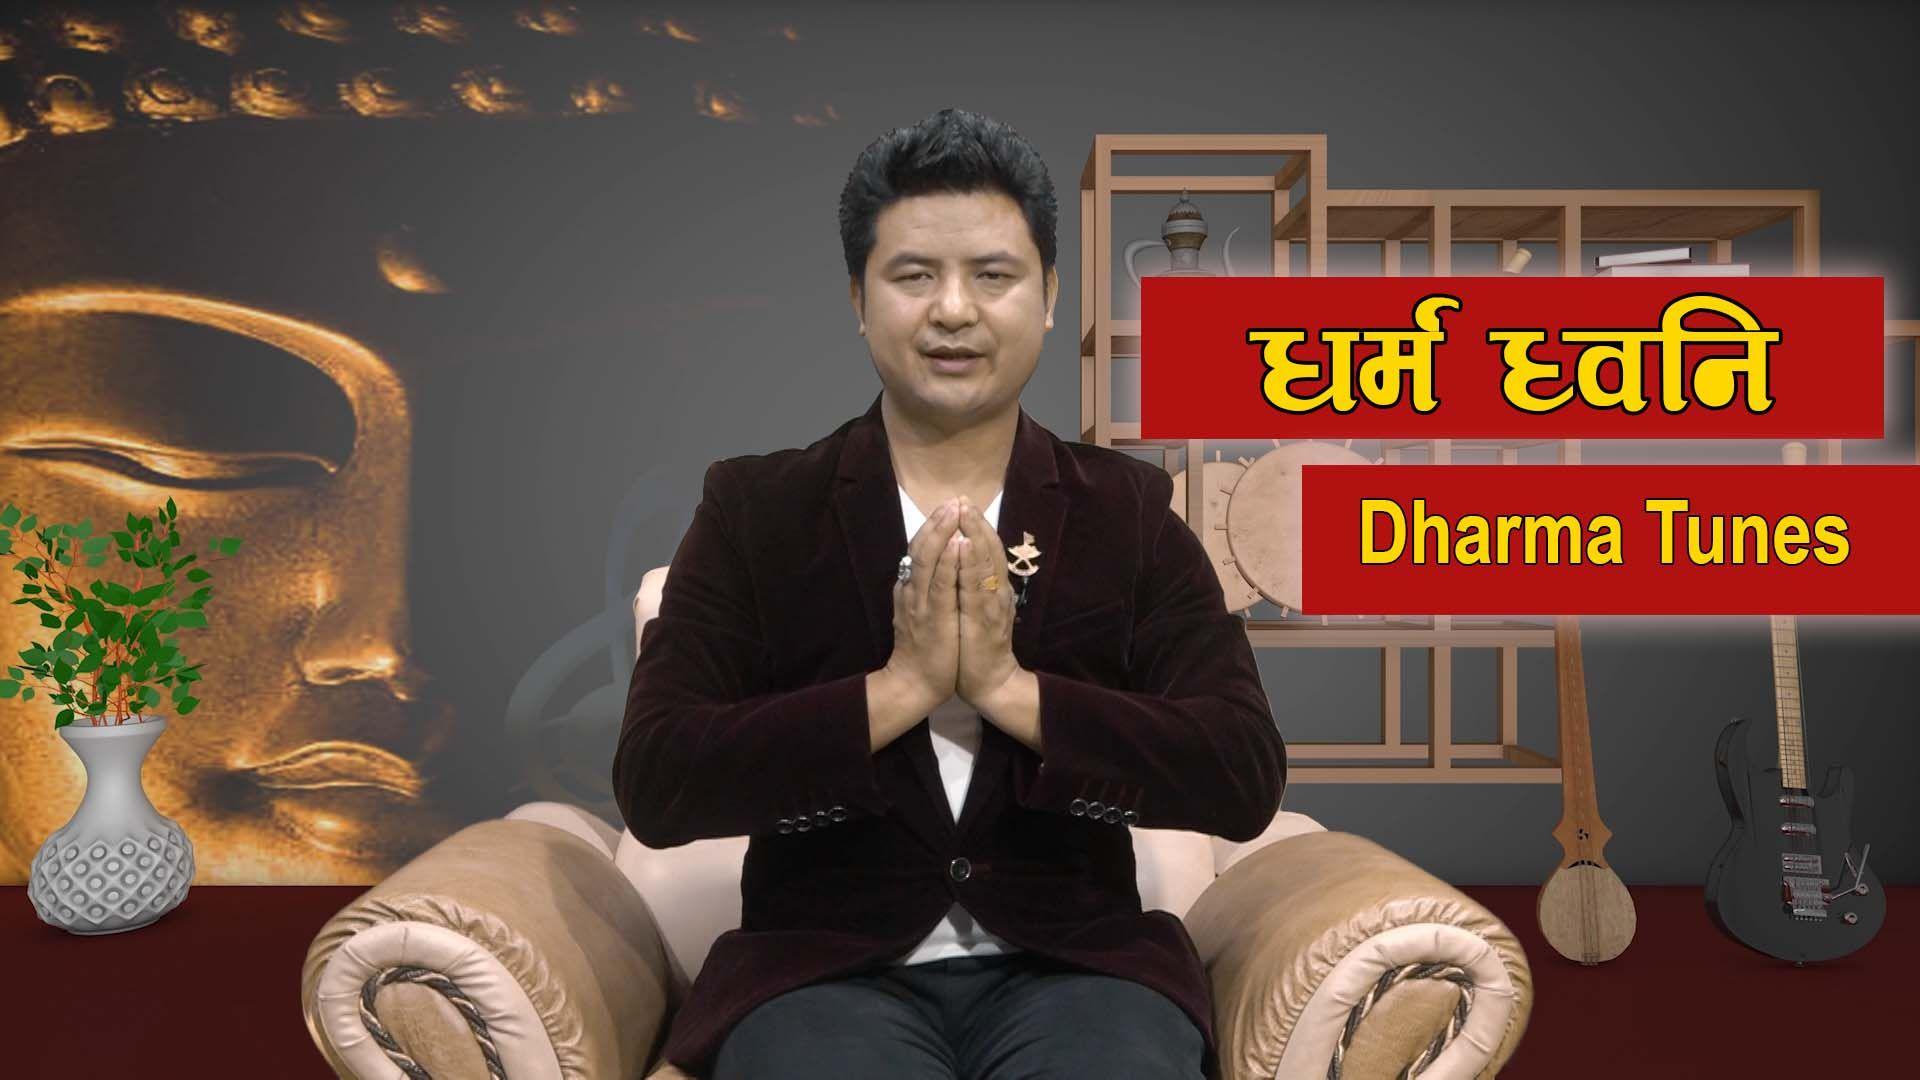 Dharma Tunes